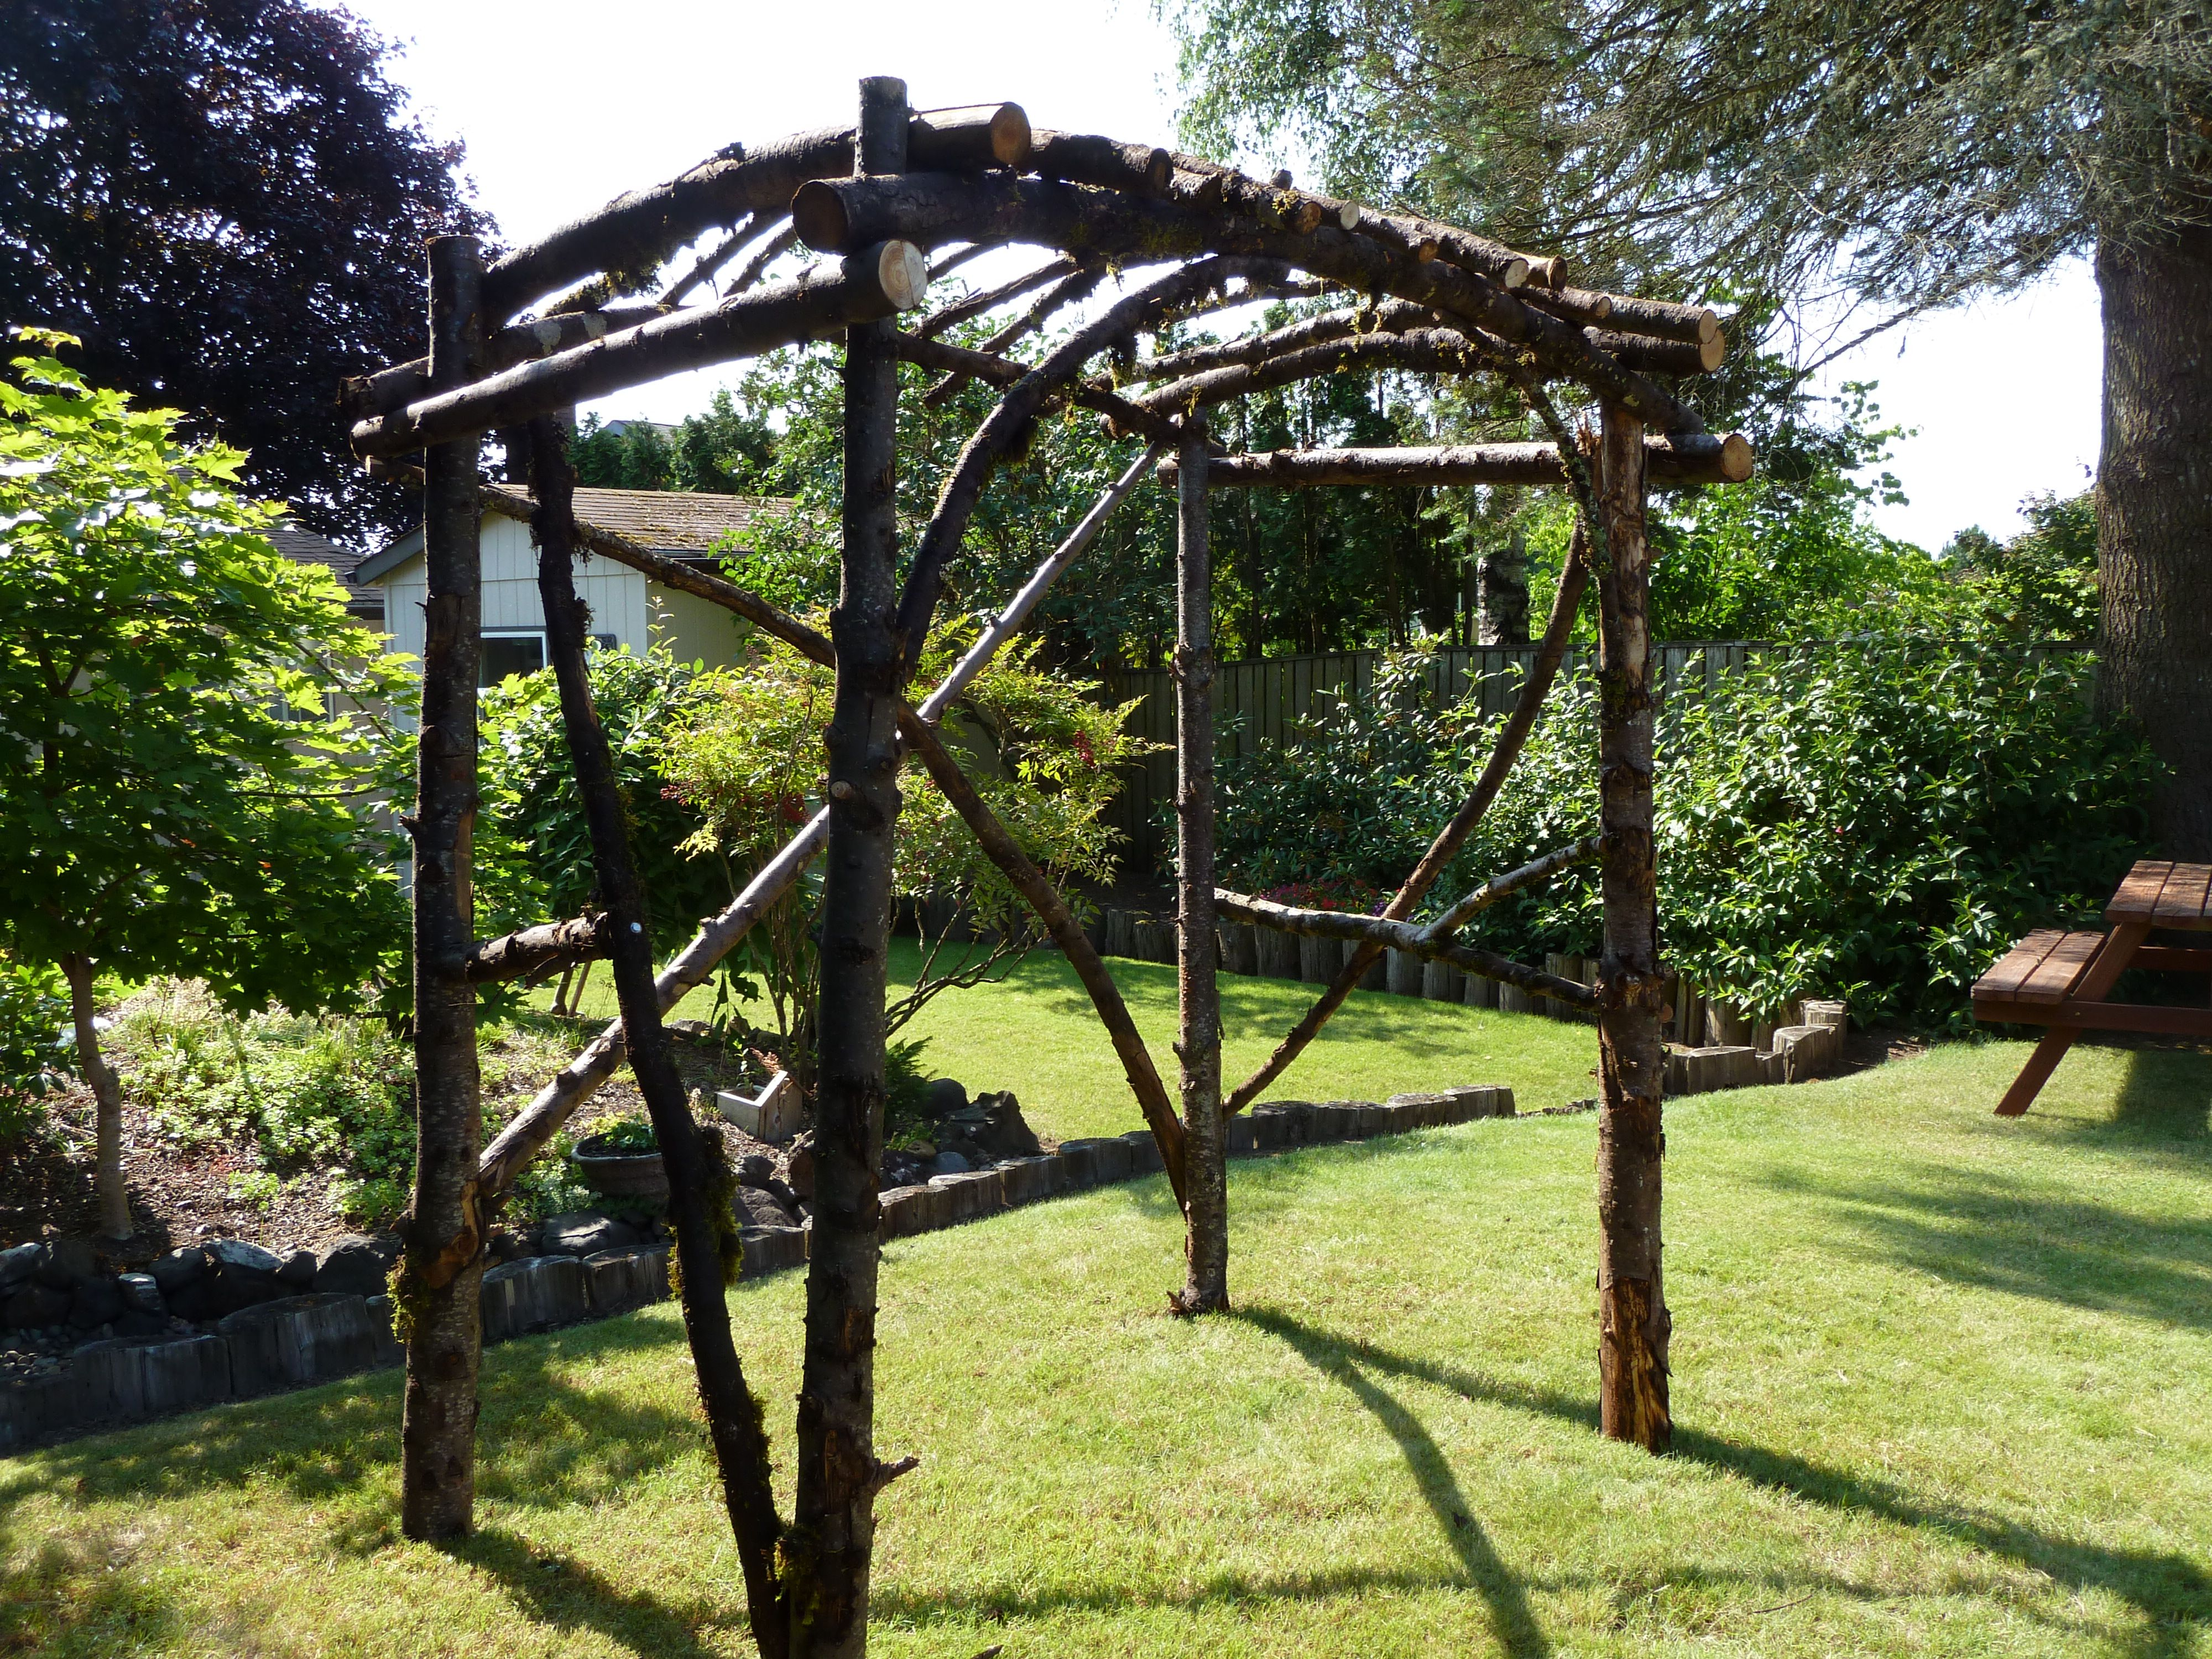 tree branch wedding arbor, son & daughter-in-law were married under ...